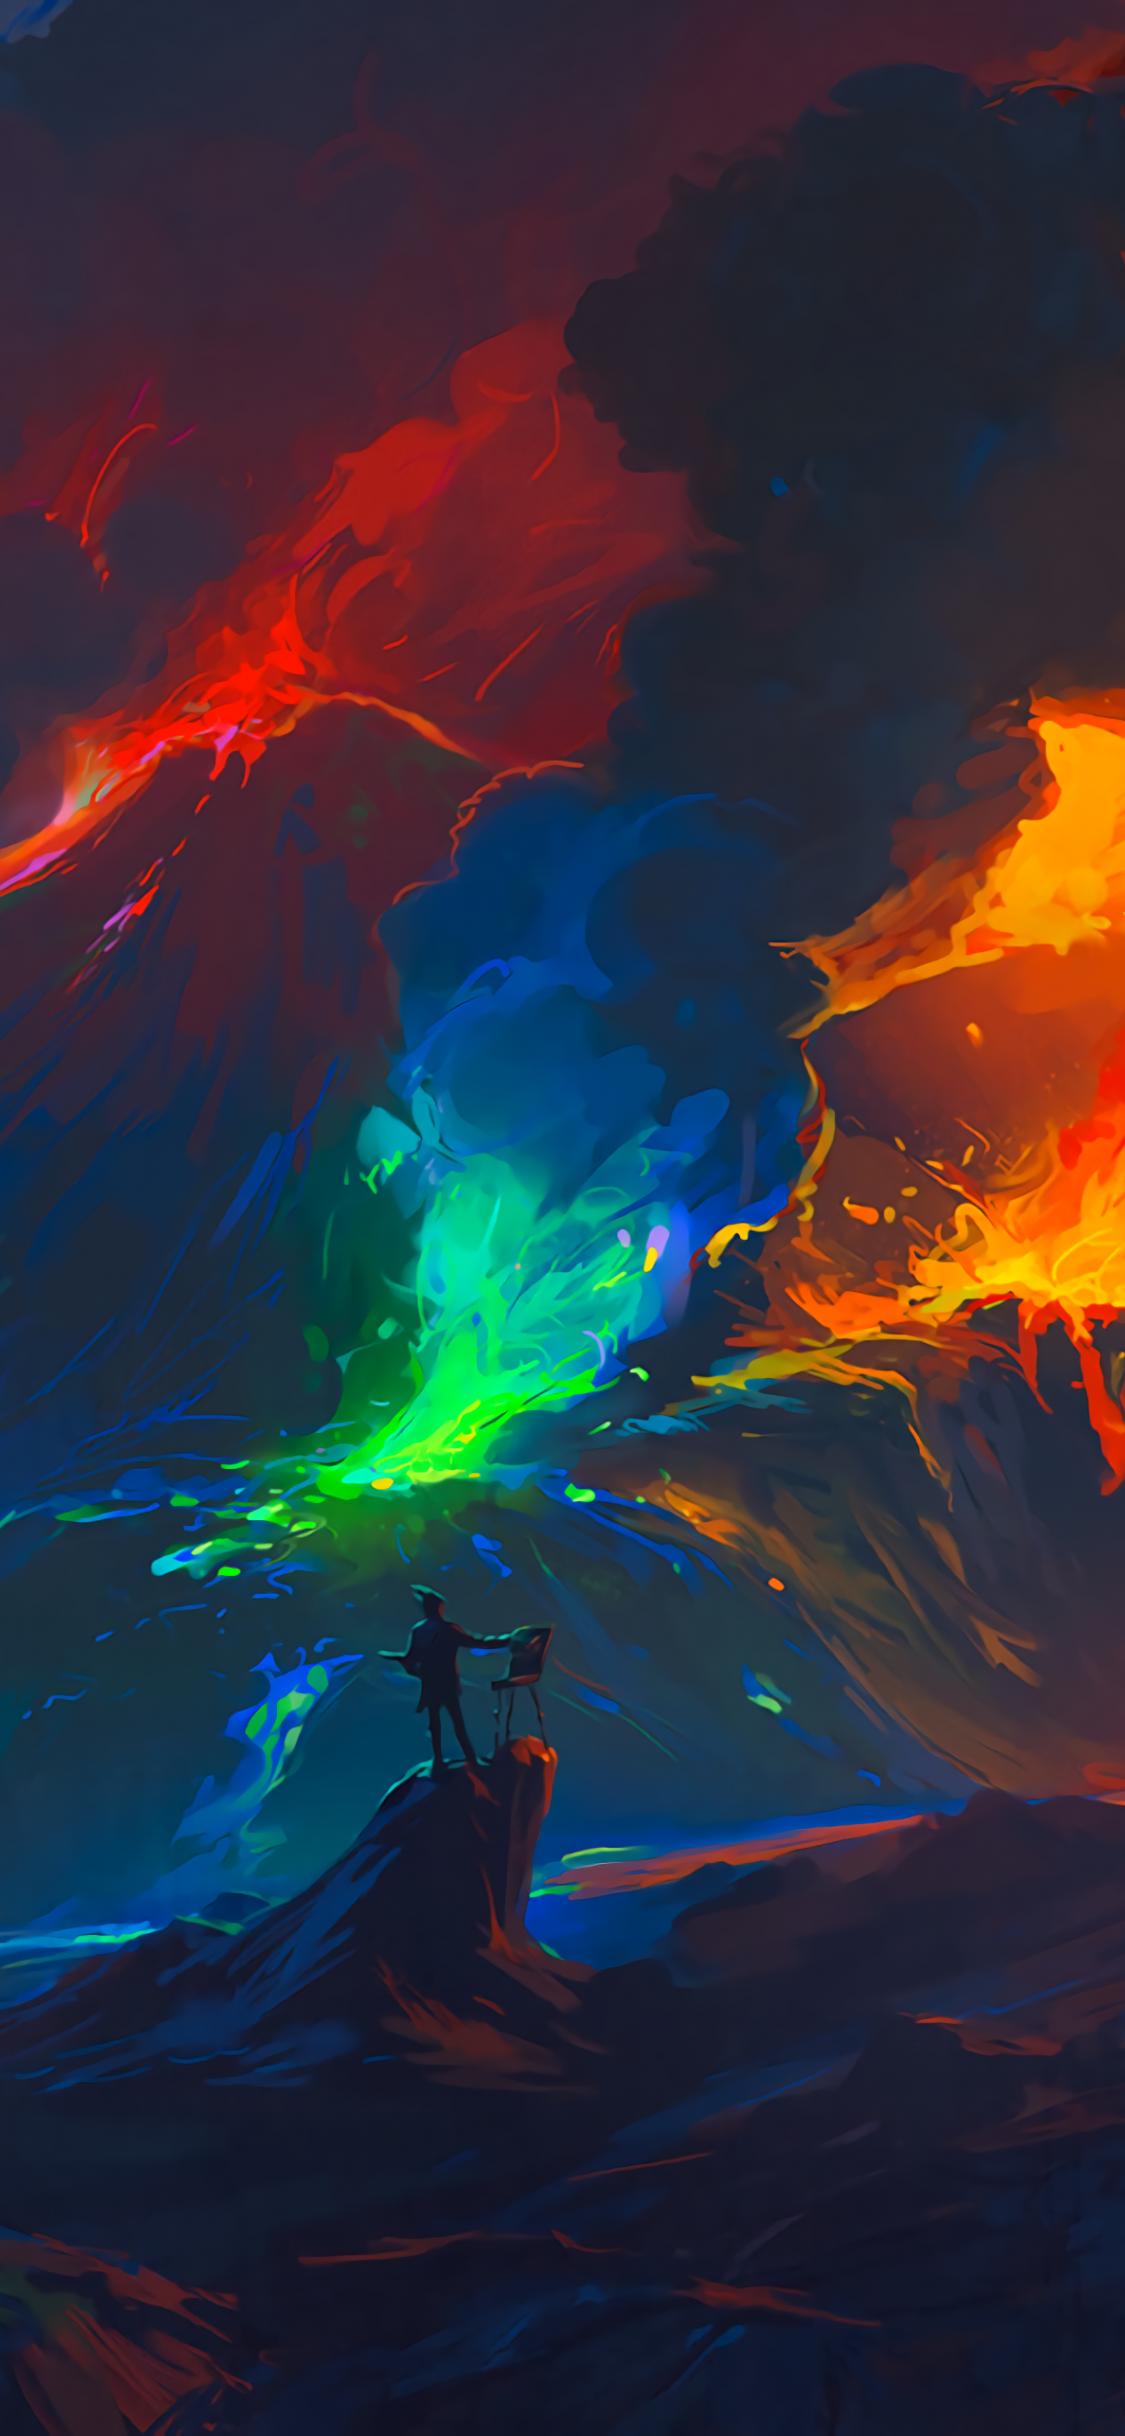 Artist Volcano Eruption Waves Colorful Fantasy Art Wallpaper Android Wallpaper Camera Wallpaper Qhd Wallpaper